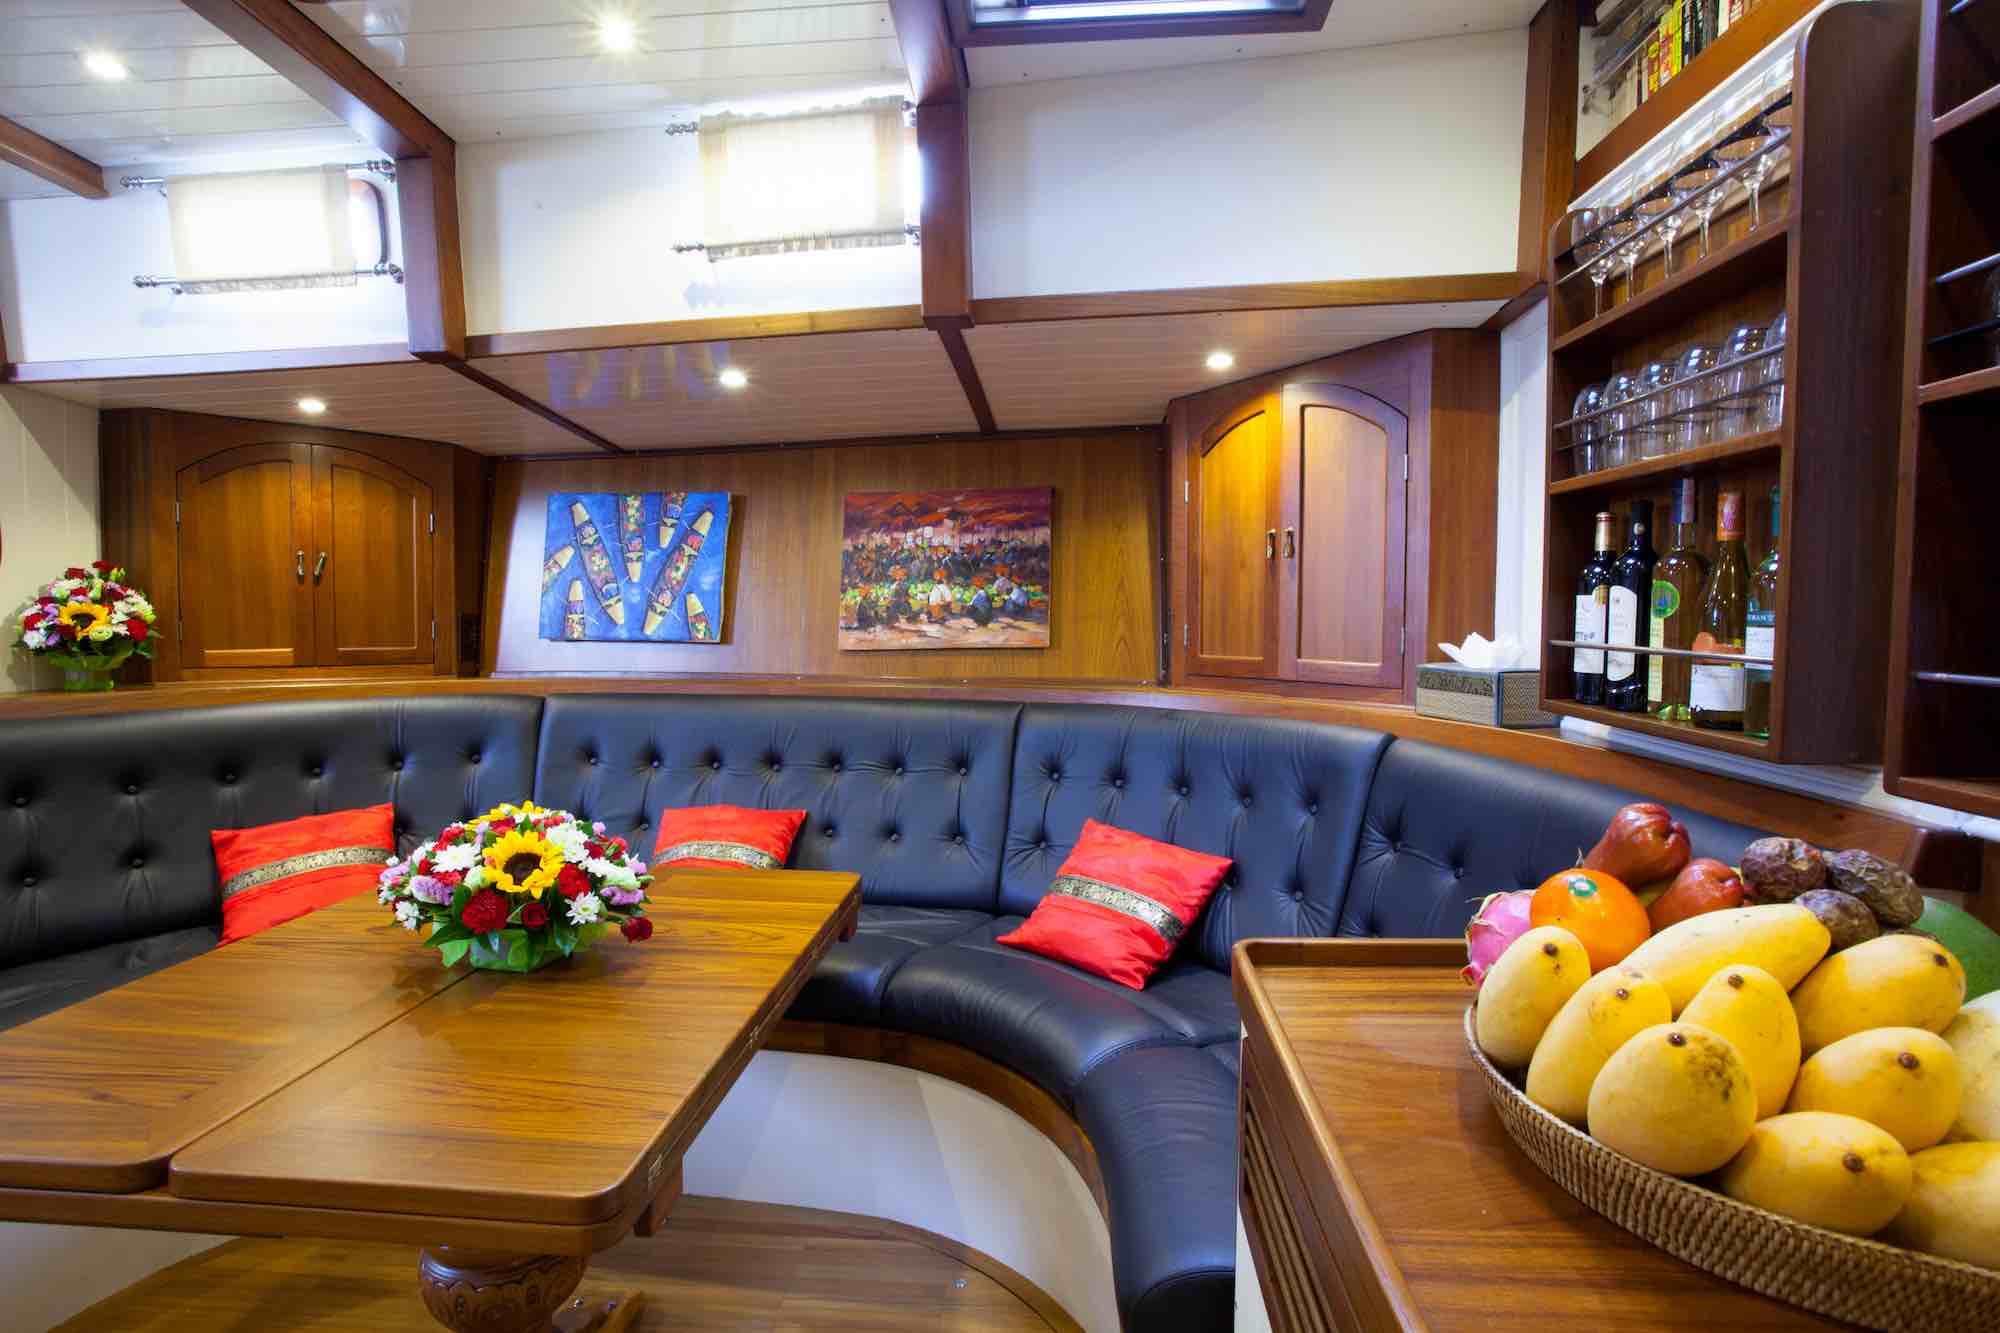 Dallinghoo_lounge area on boat sailing in Mergui 4_XS.jpeg